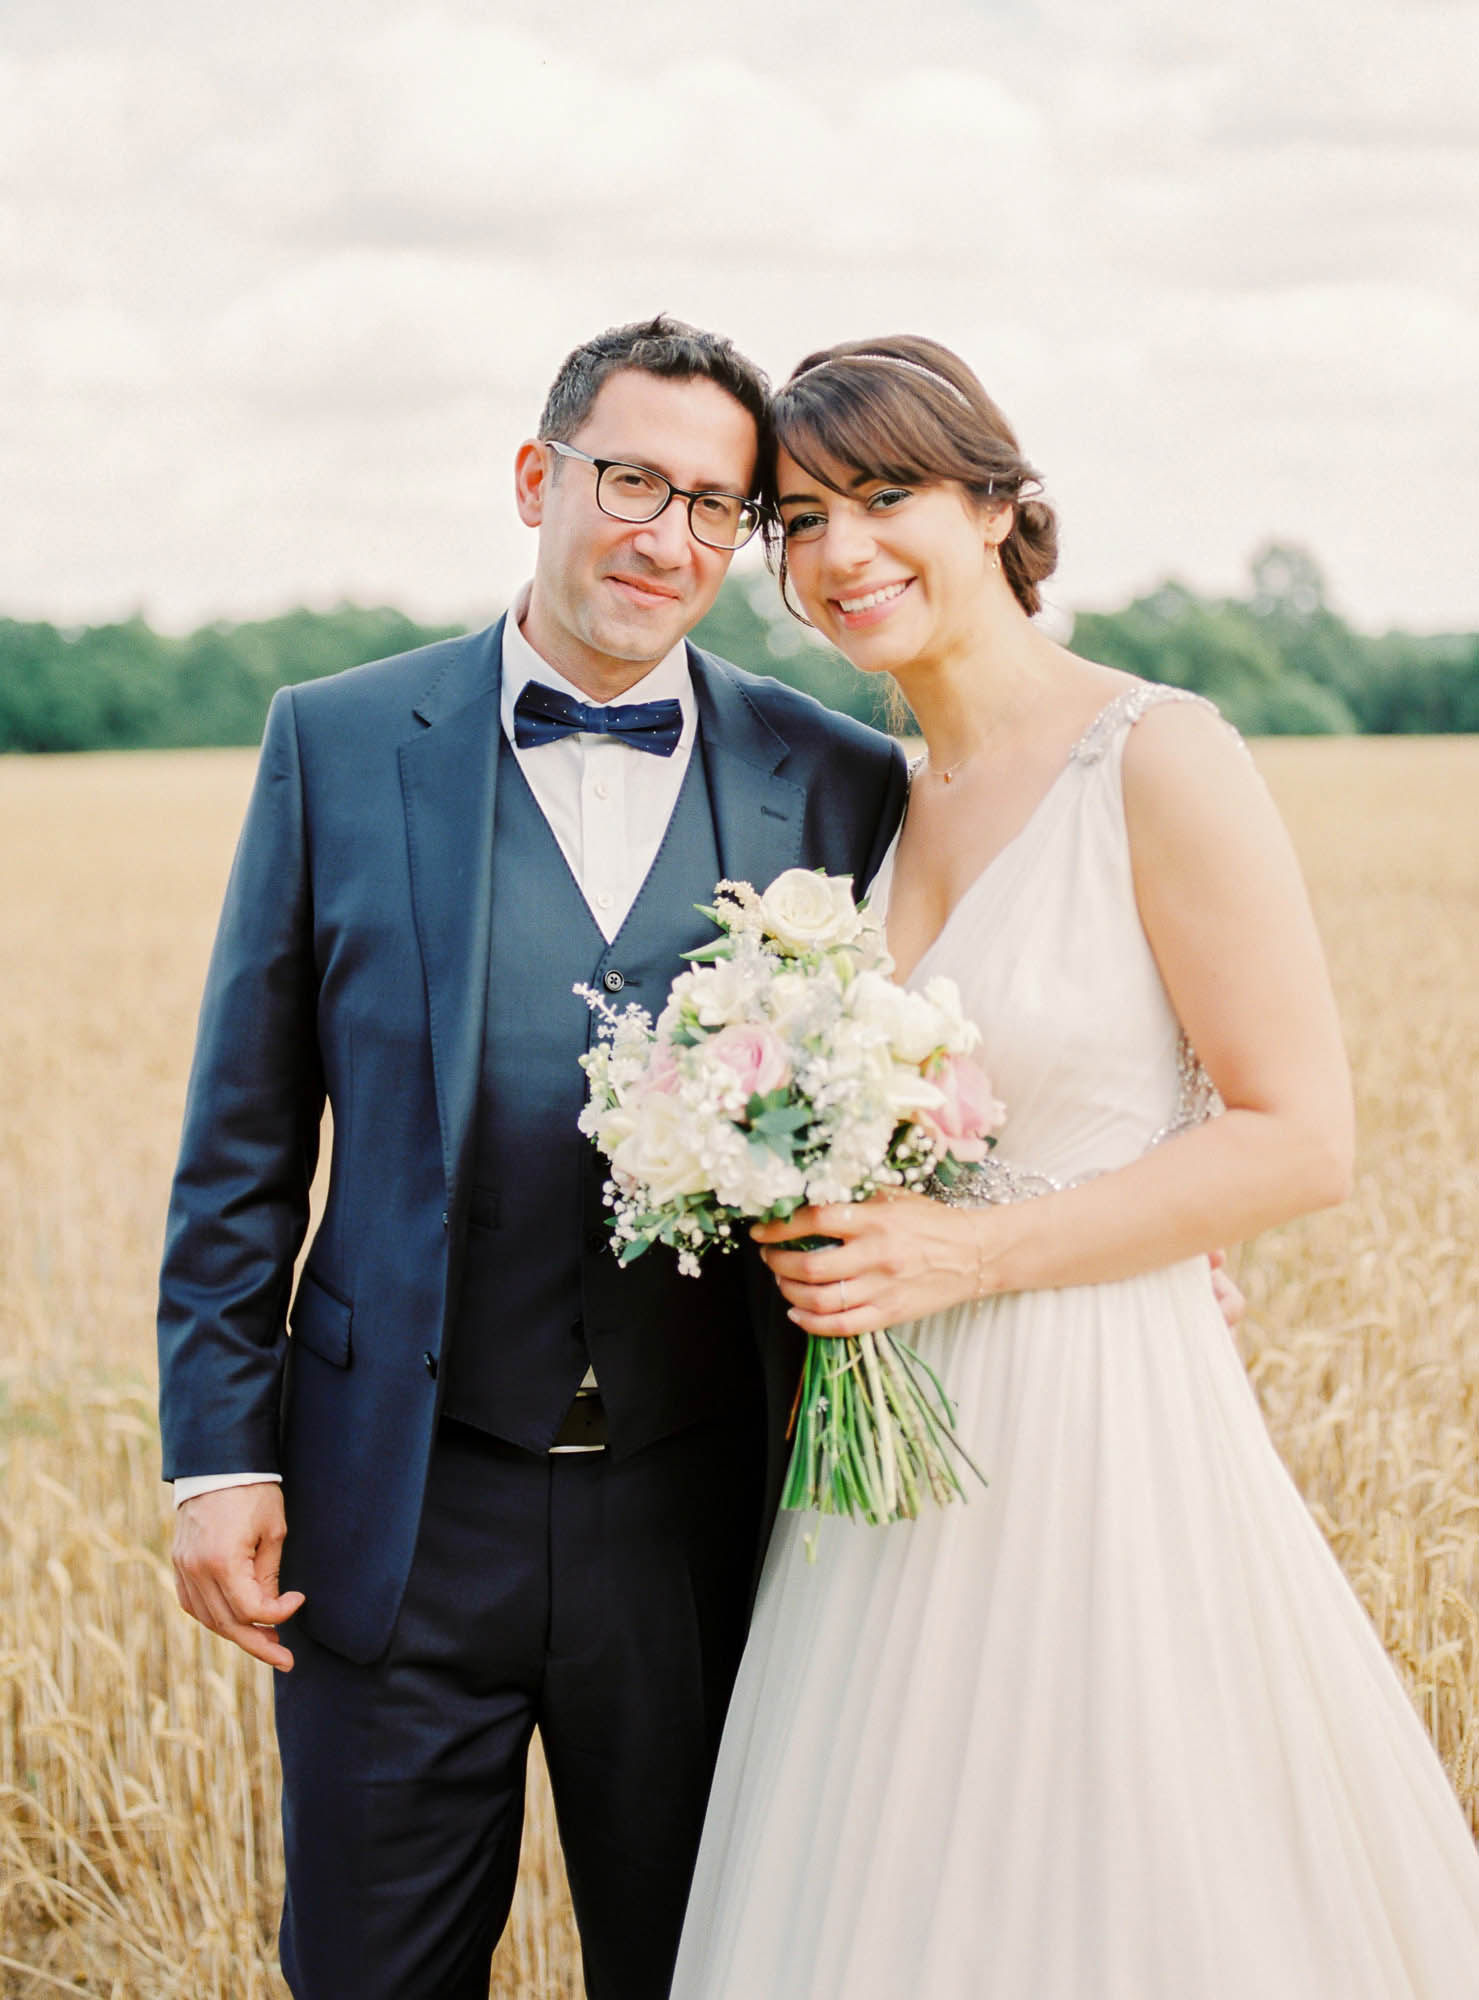 Amy O'Boyle Photography- Destination & UK Fine Art Film Wedding Photographer- Brickendonbury Estate Wedding-26.jpg